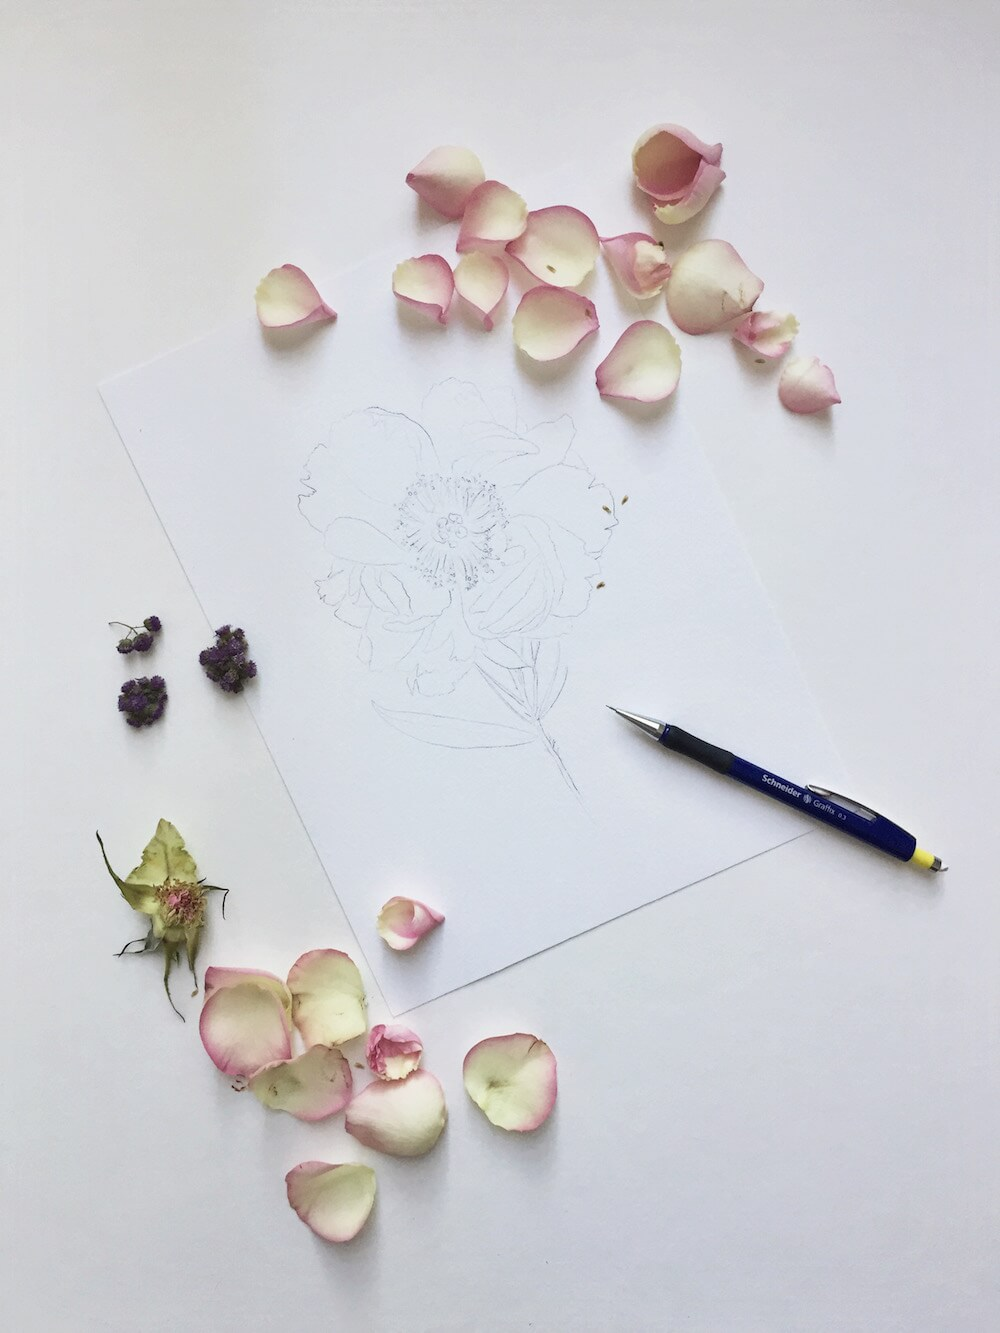 floral peonie blush skizze doodle art Pfingsrose Bleistift Graffix Schneider fine art calligraphy